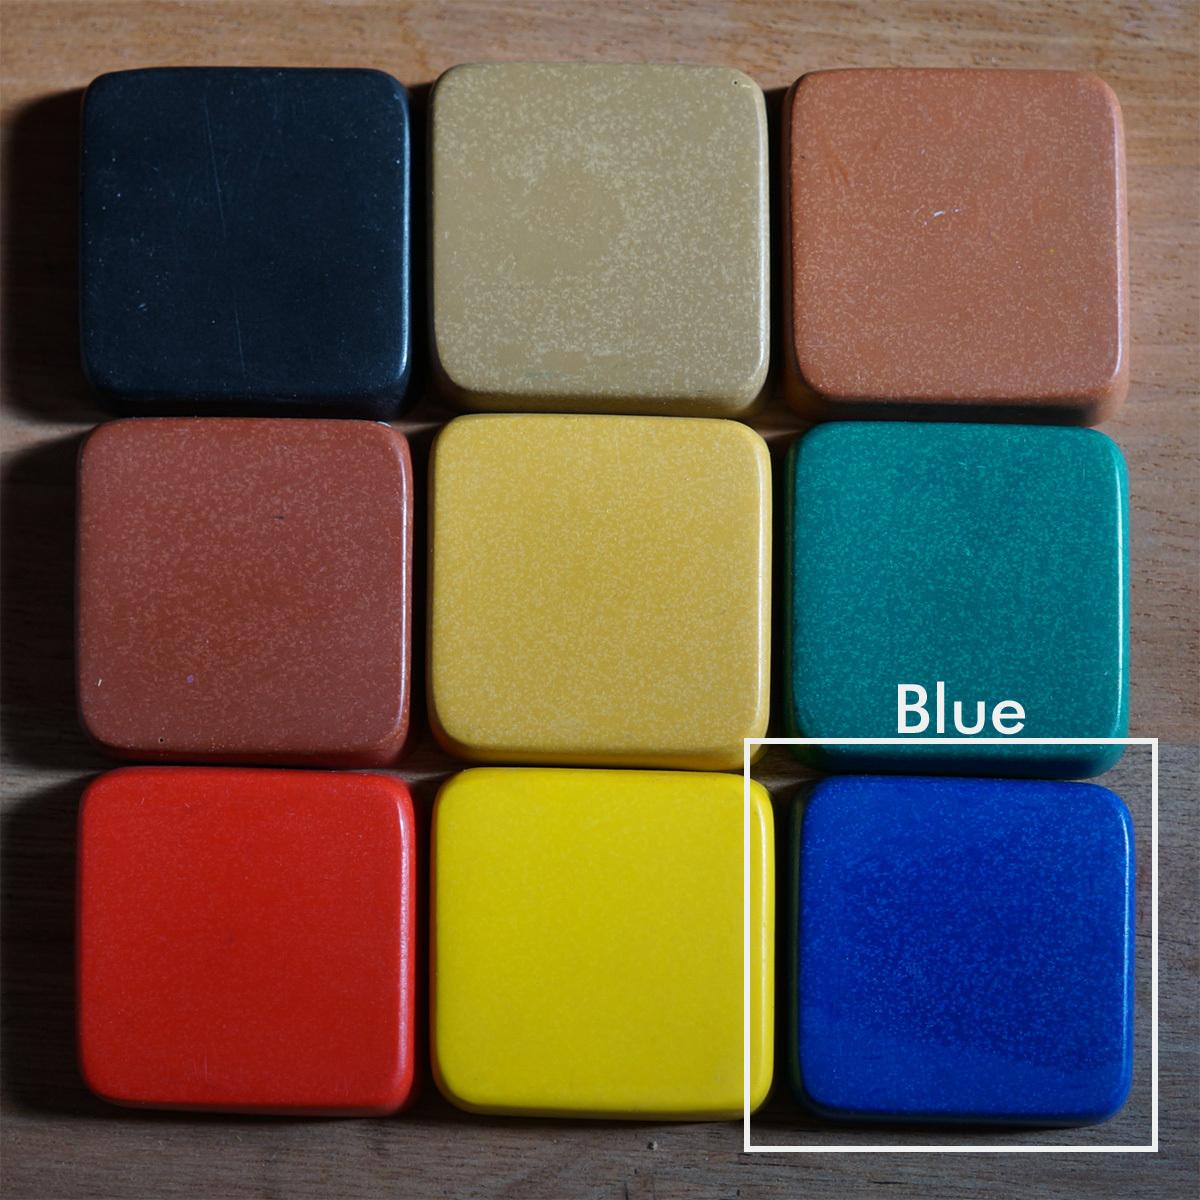 PIGMENT BLUE 100g(着色剤:青 100g) - 画像2